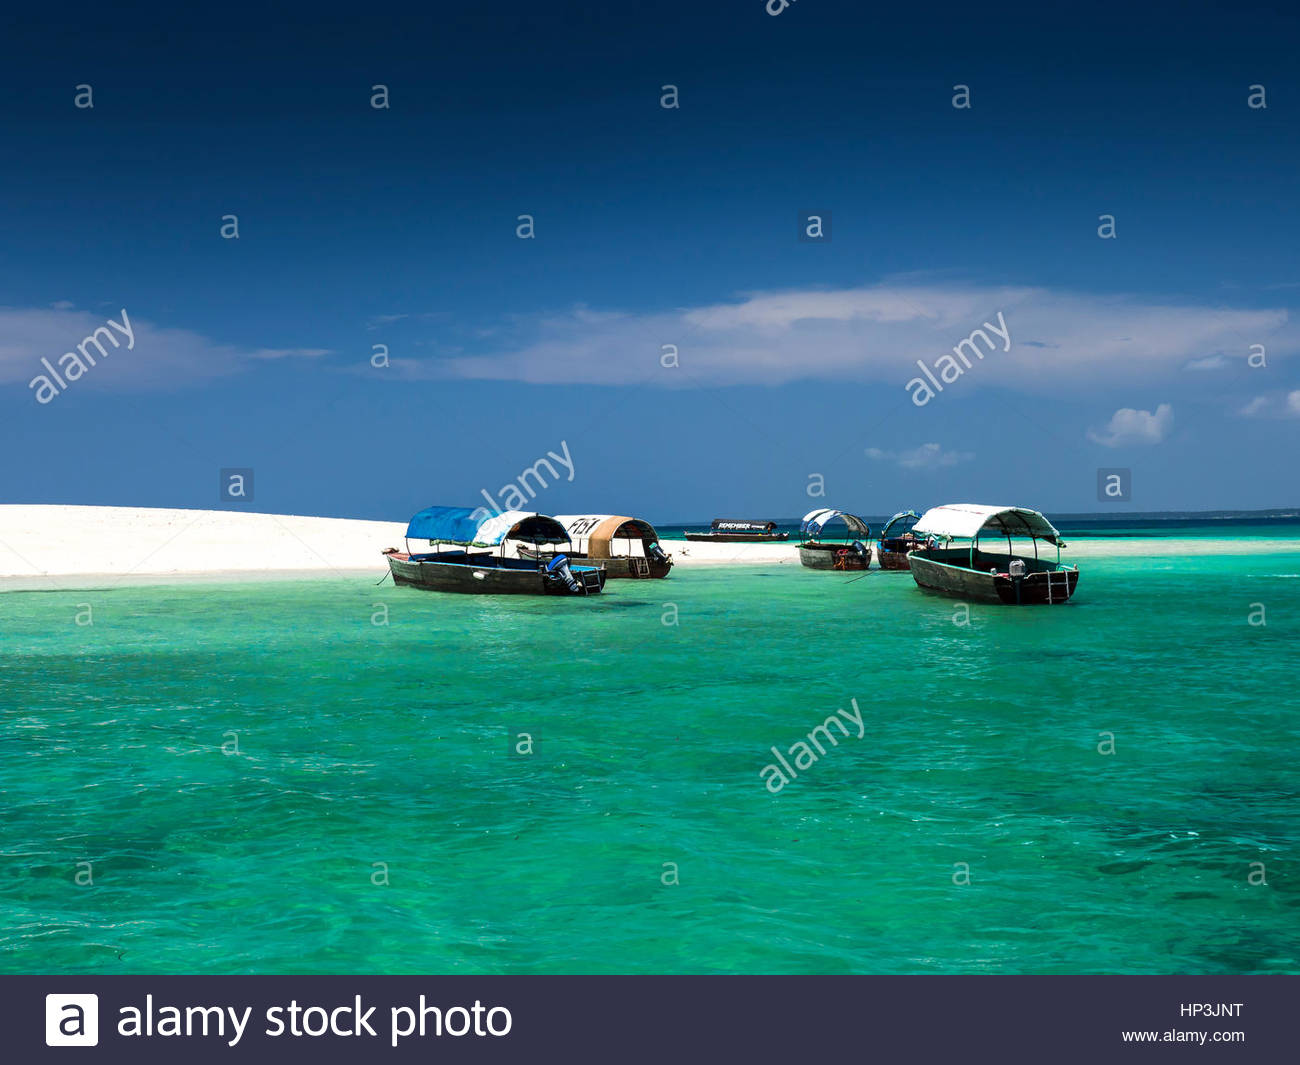 Boats in front of Prison Island, Sandbar, Zanzibar Archipelago, Tanzania - Stock Image